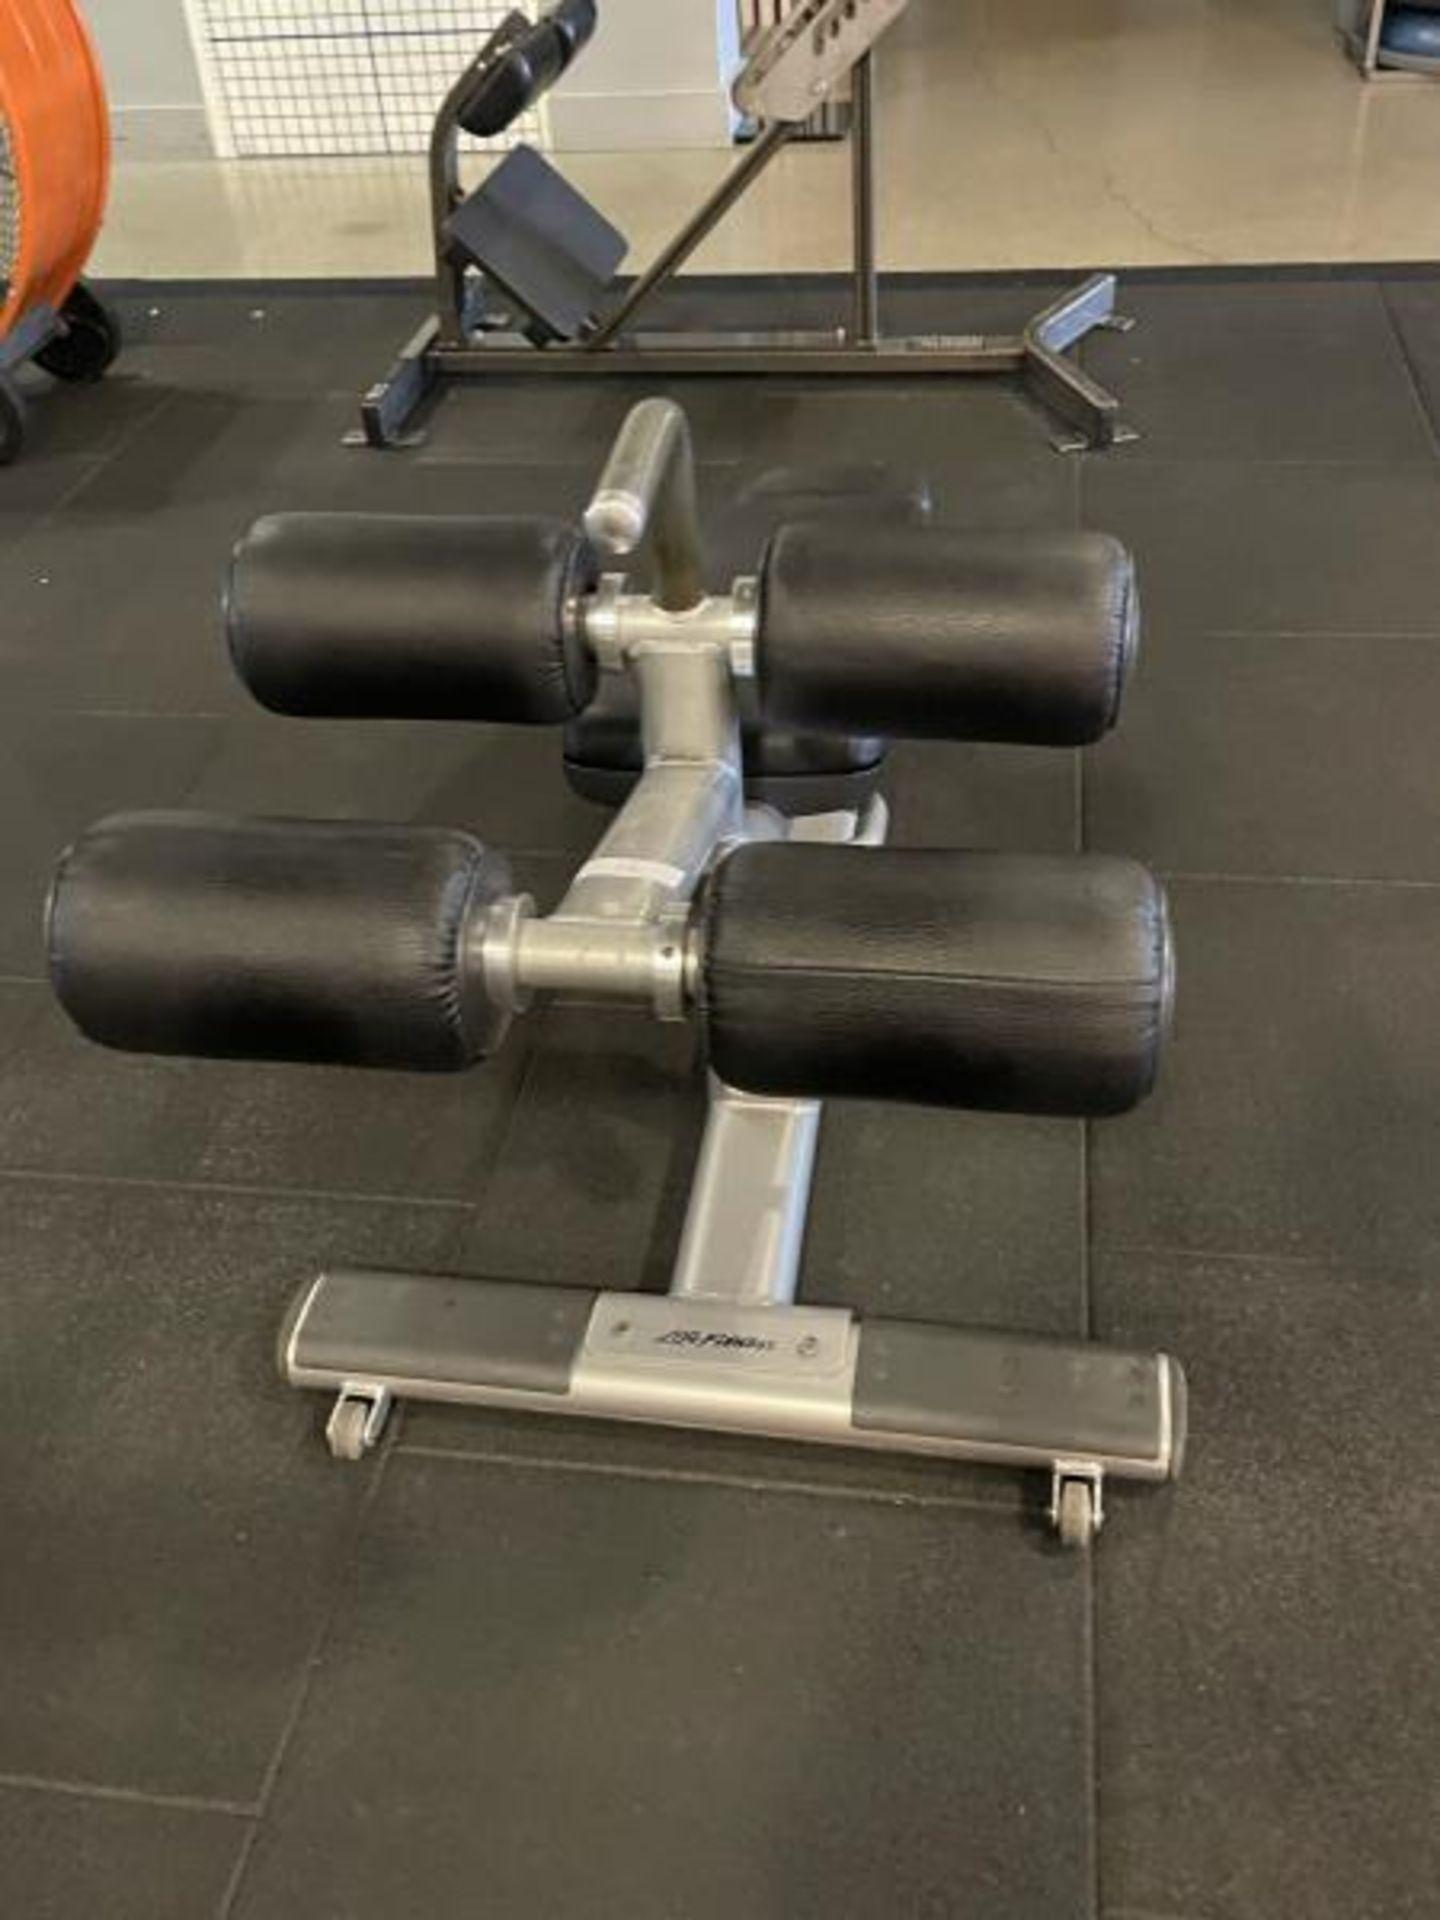 Hammer Strength Decline Bench M: SADB - Image 3 of 3